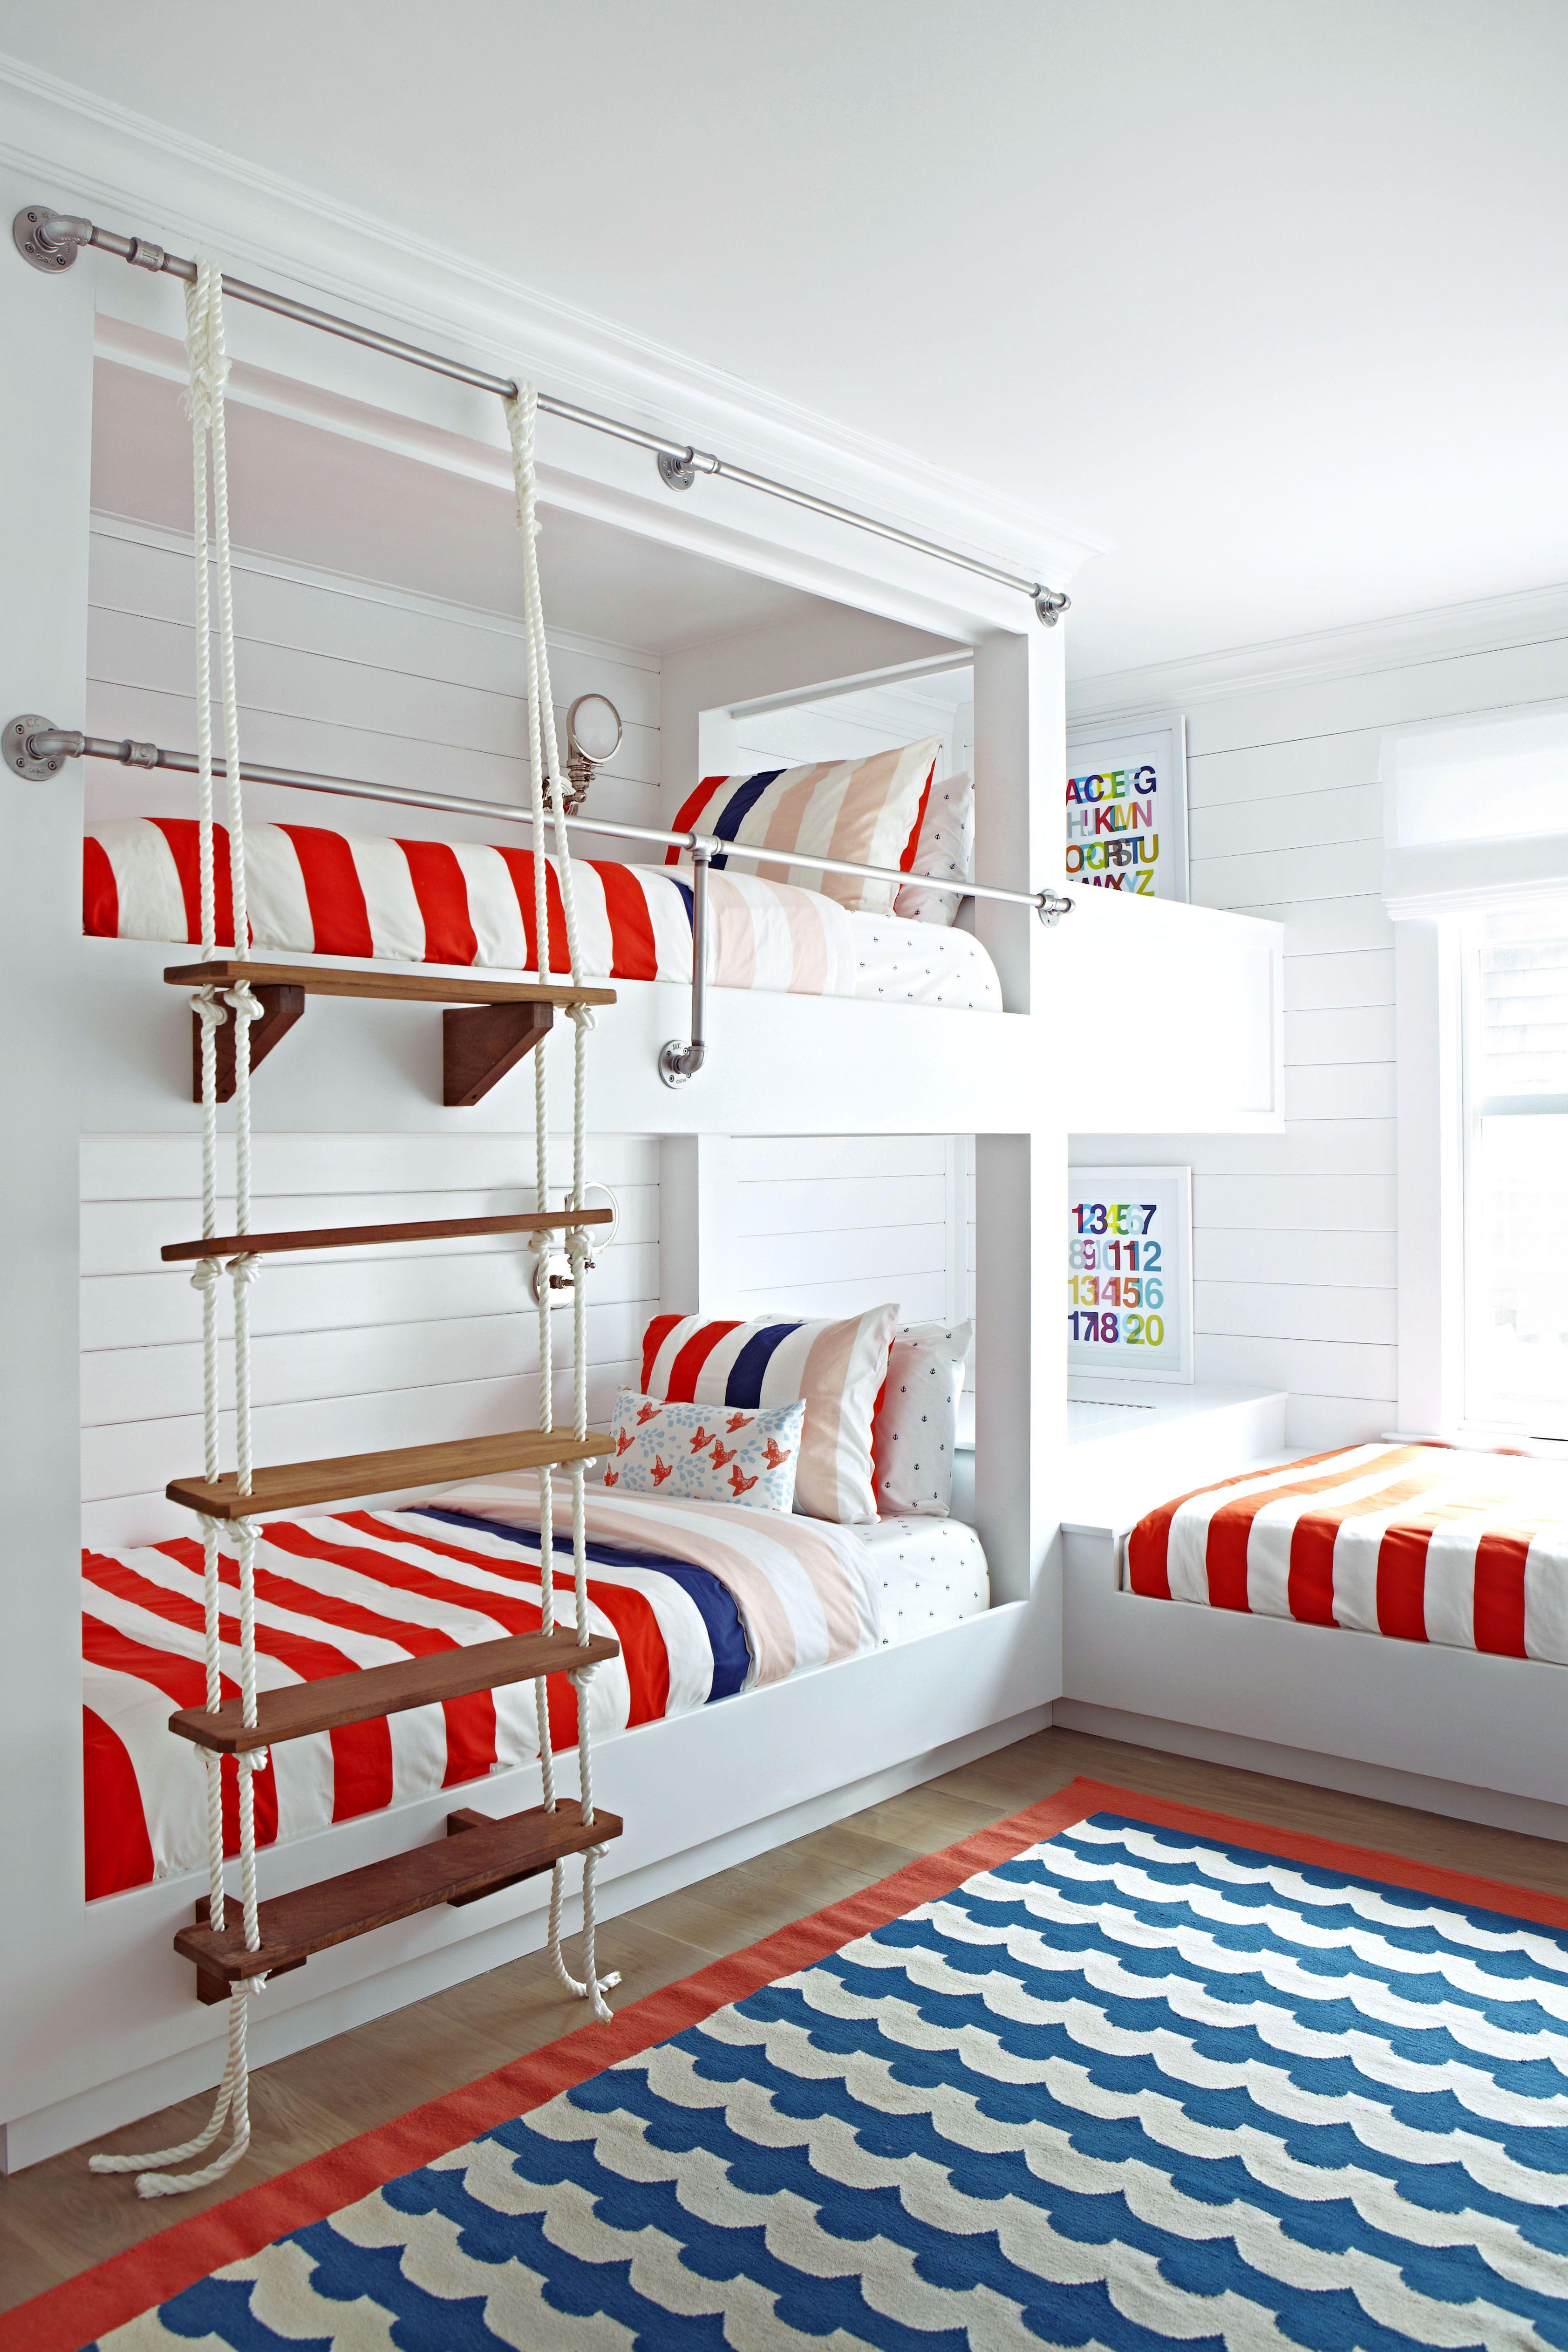 30+ Best Kids Room Ideas - DIY Boys and Girls Bedroom ...